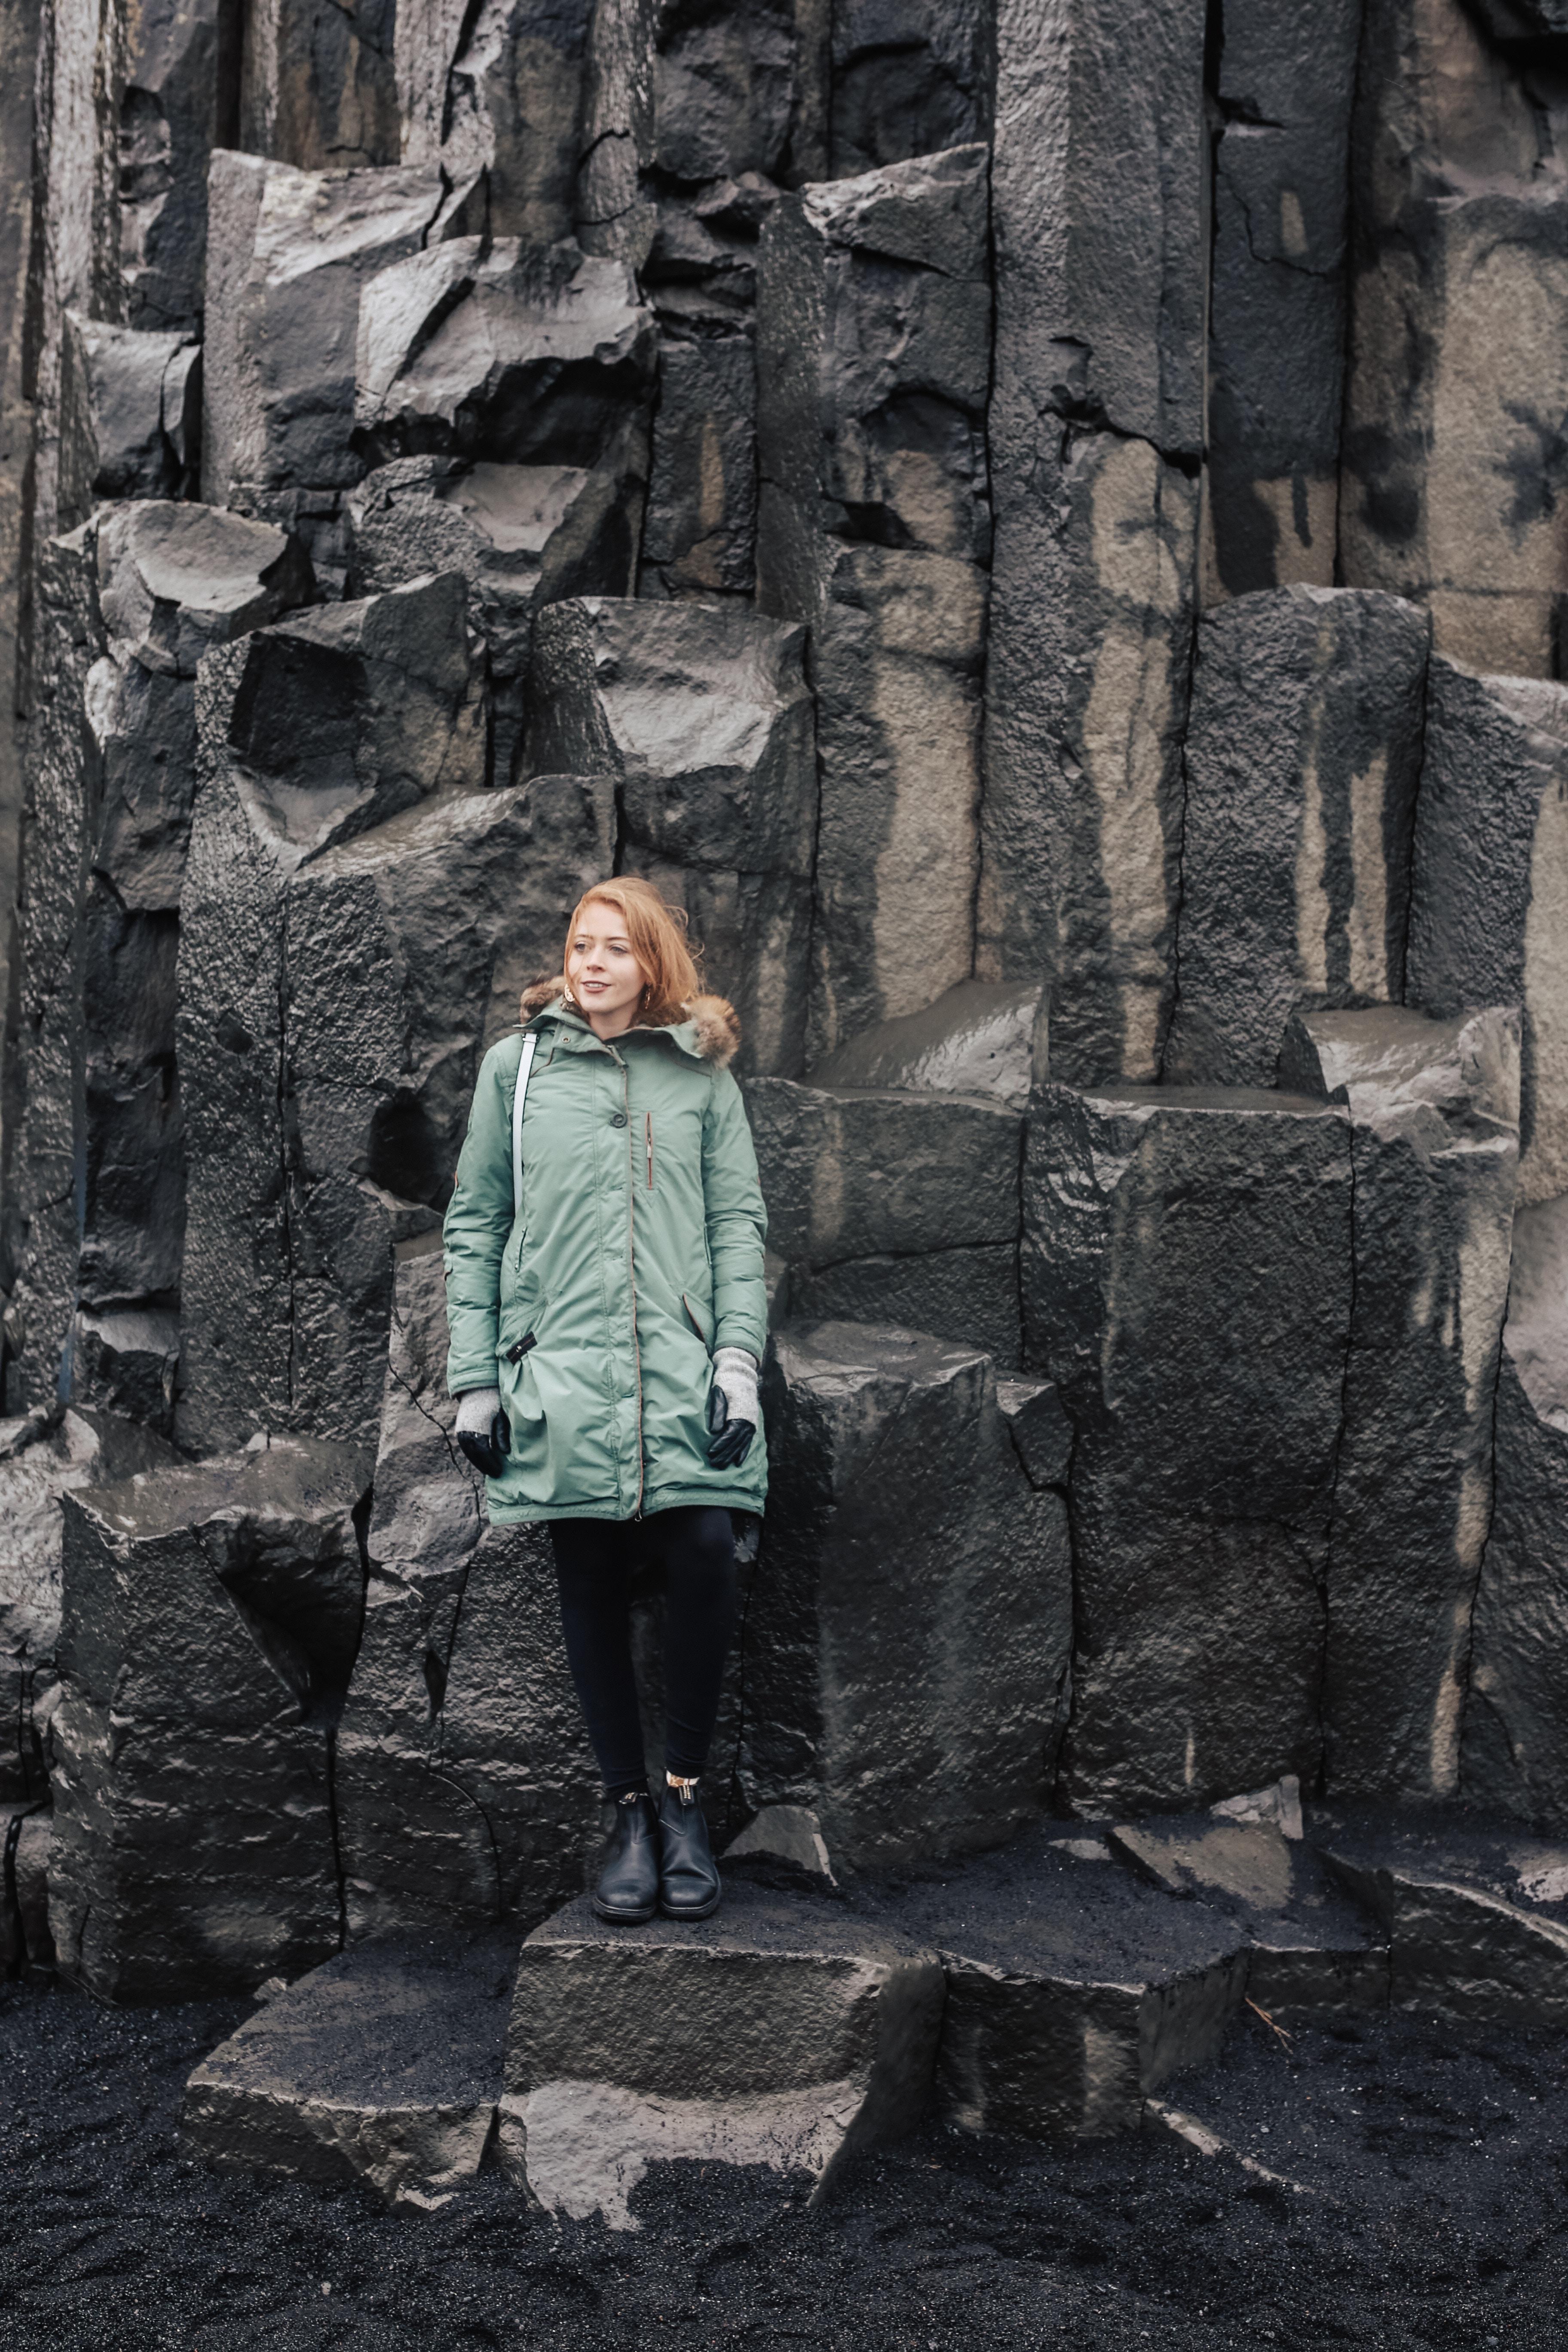 Exploring the infamous Reynisdrangar basalt sea rocks at Reynisfjara Beach in South Iceland.